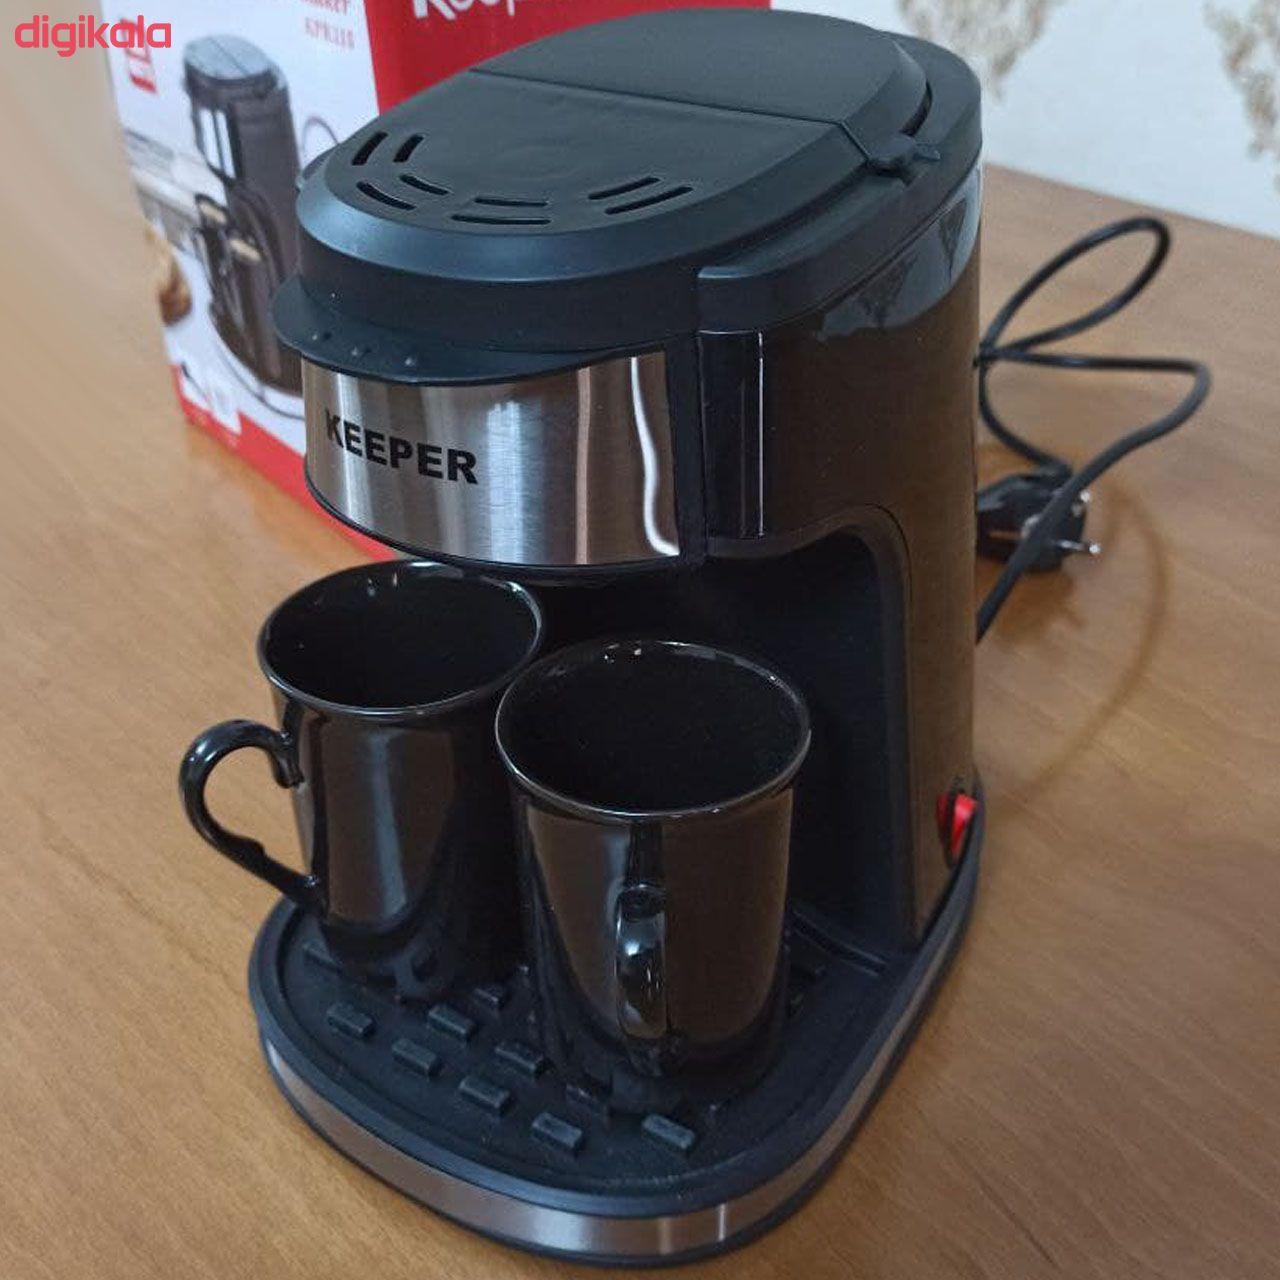 قهوه ساز کیپر مدل KPR115 main 1 2